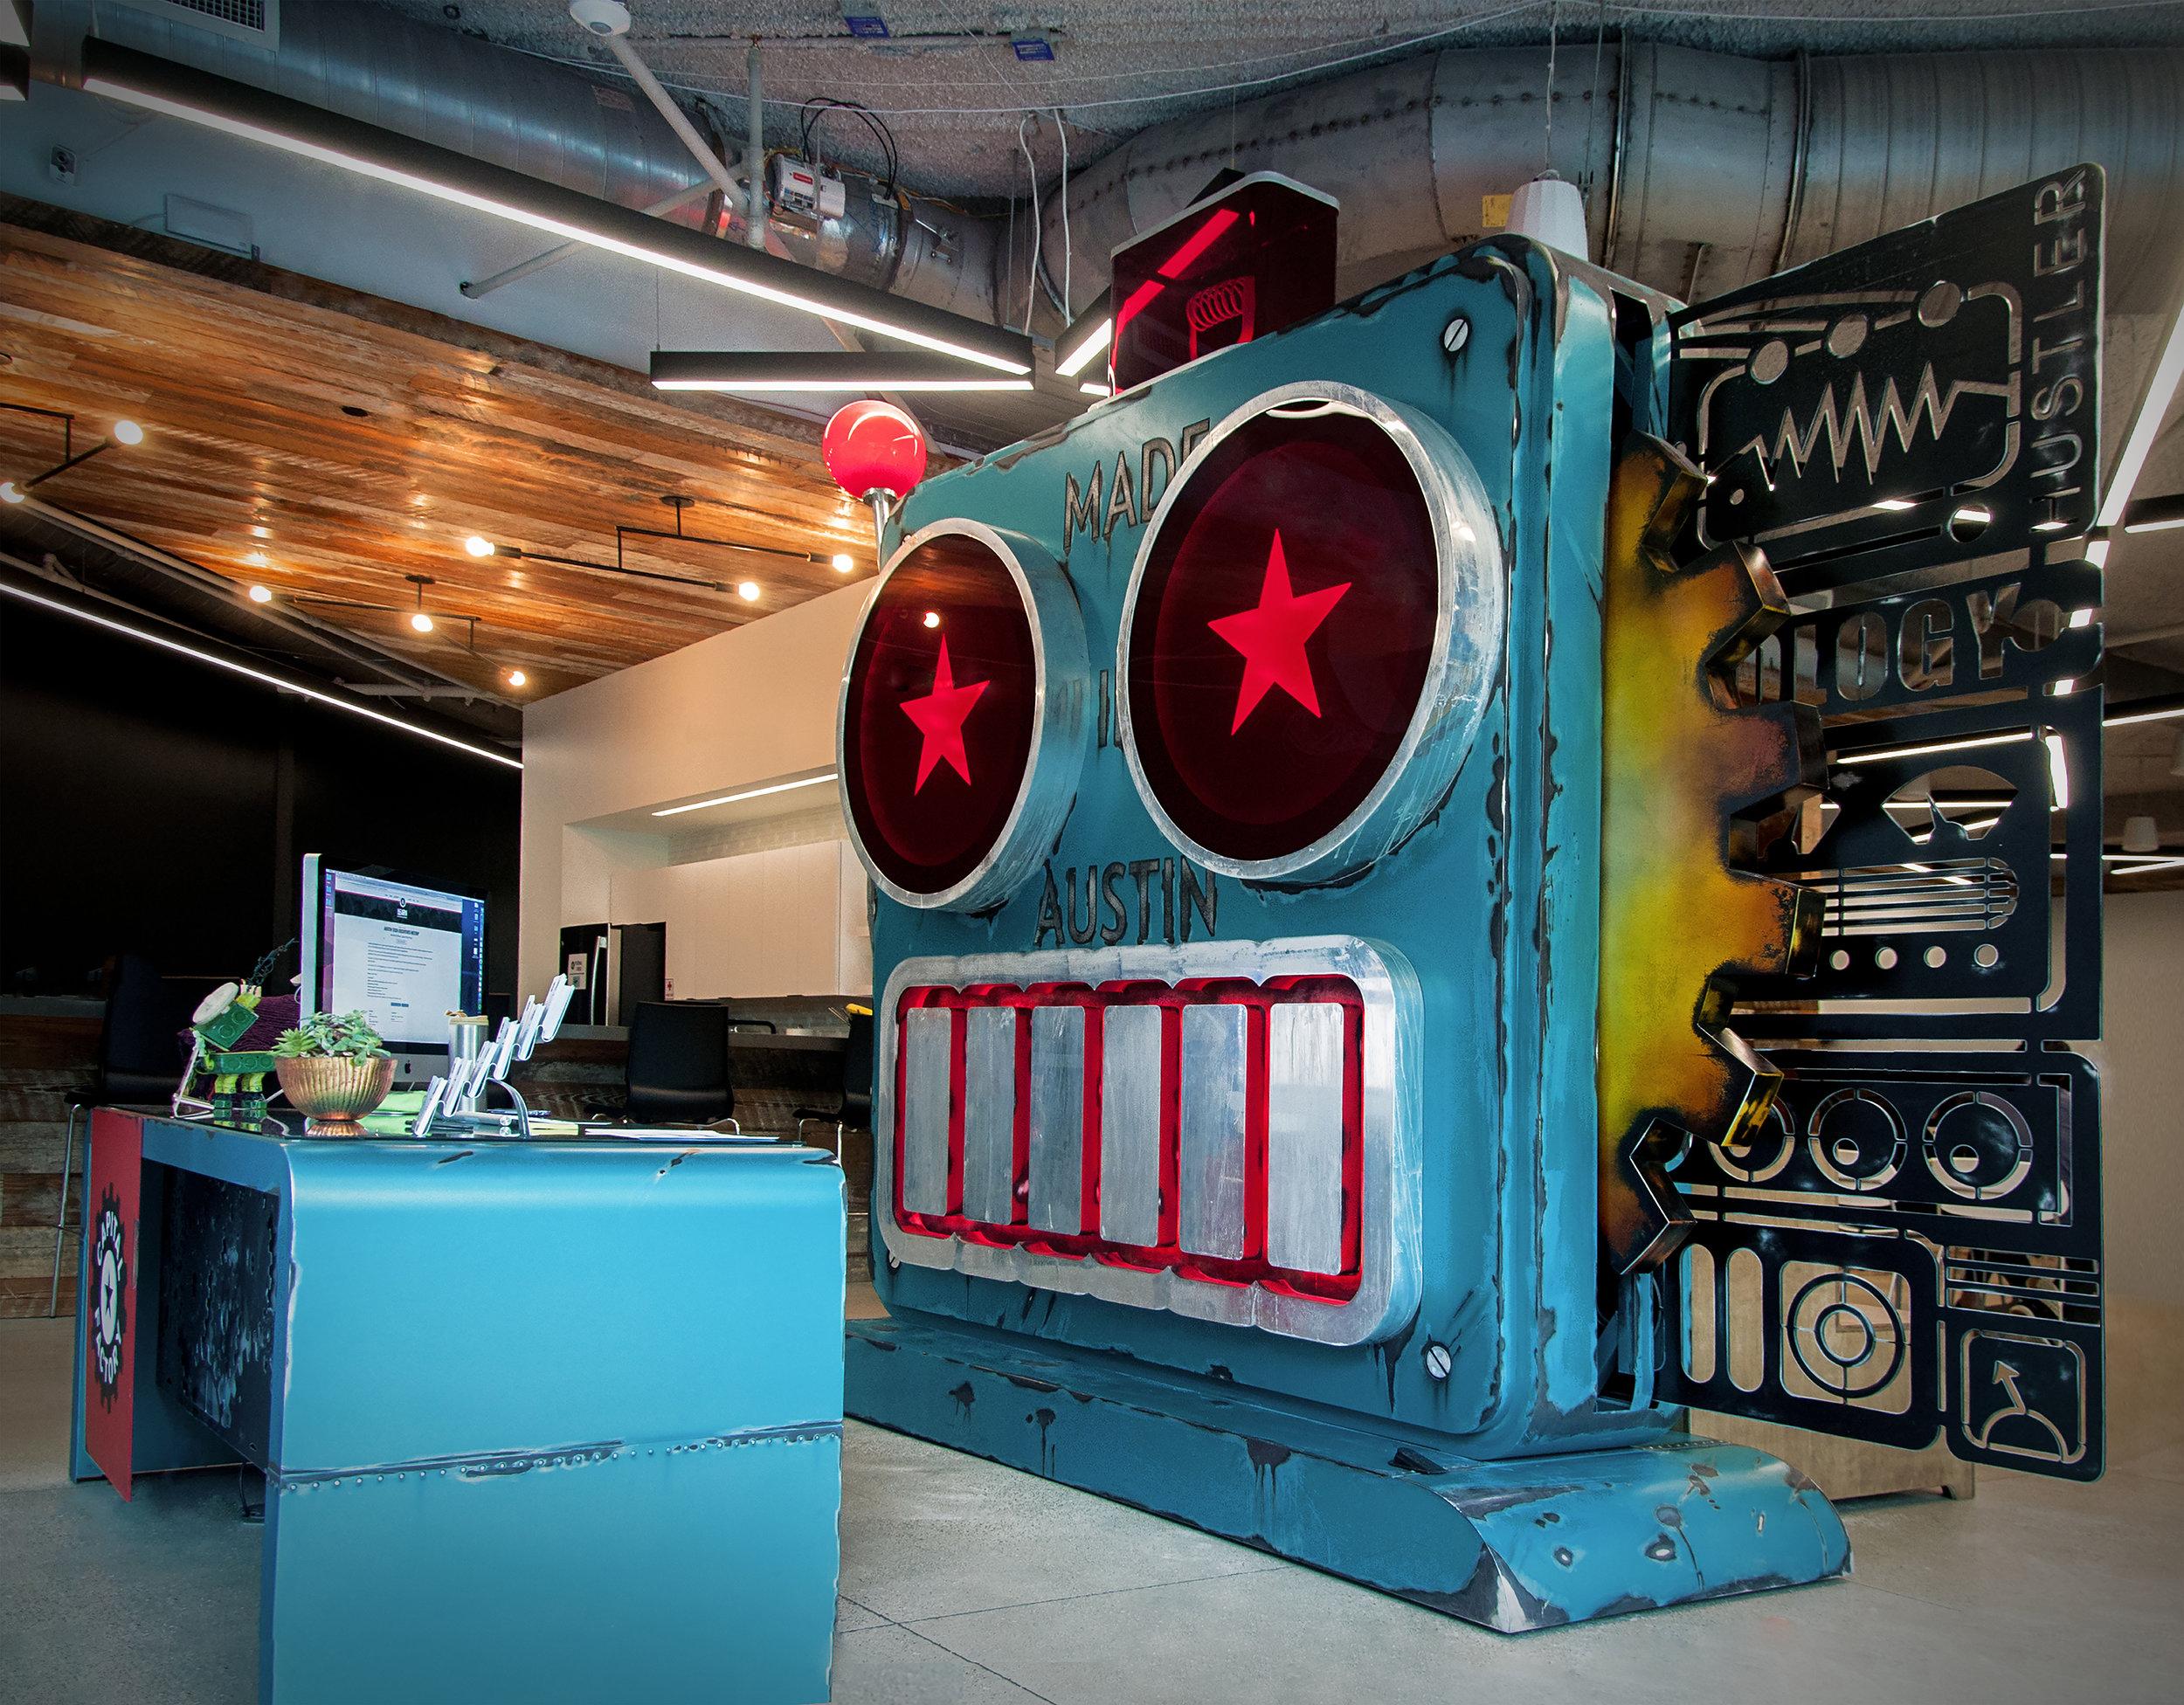 Robot Screen_Desk72dpi.jpg